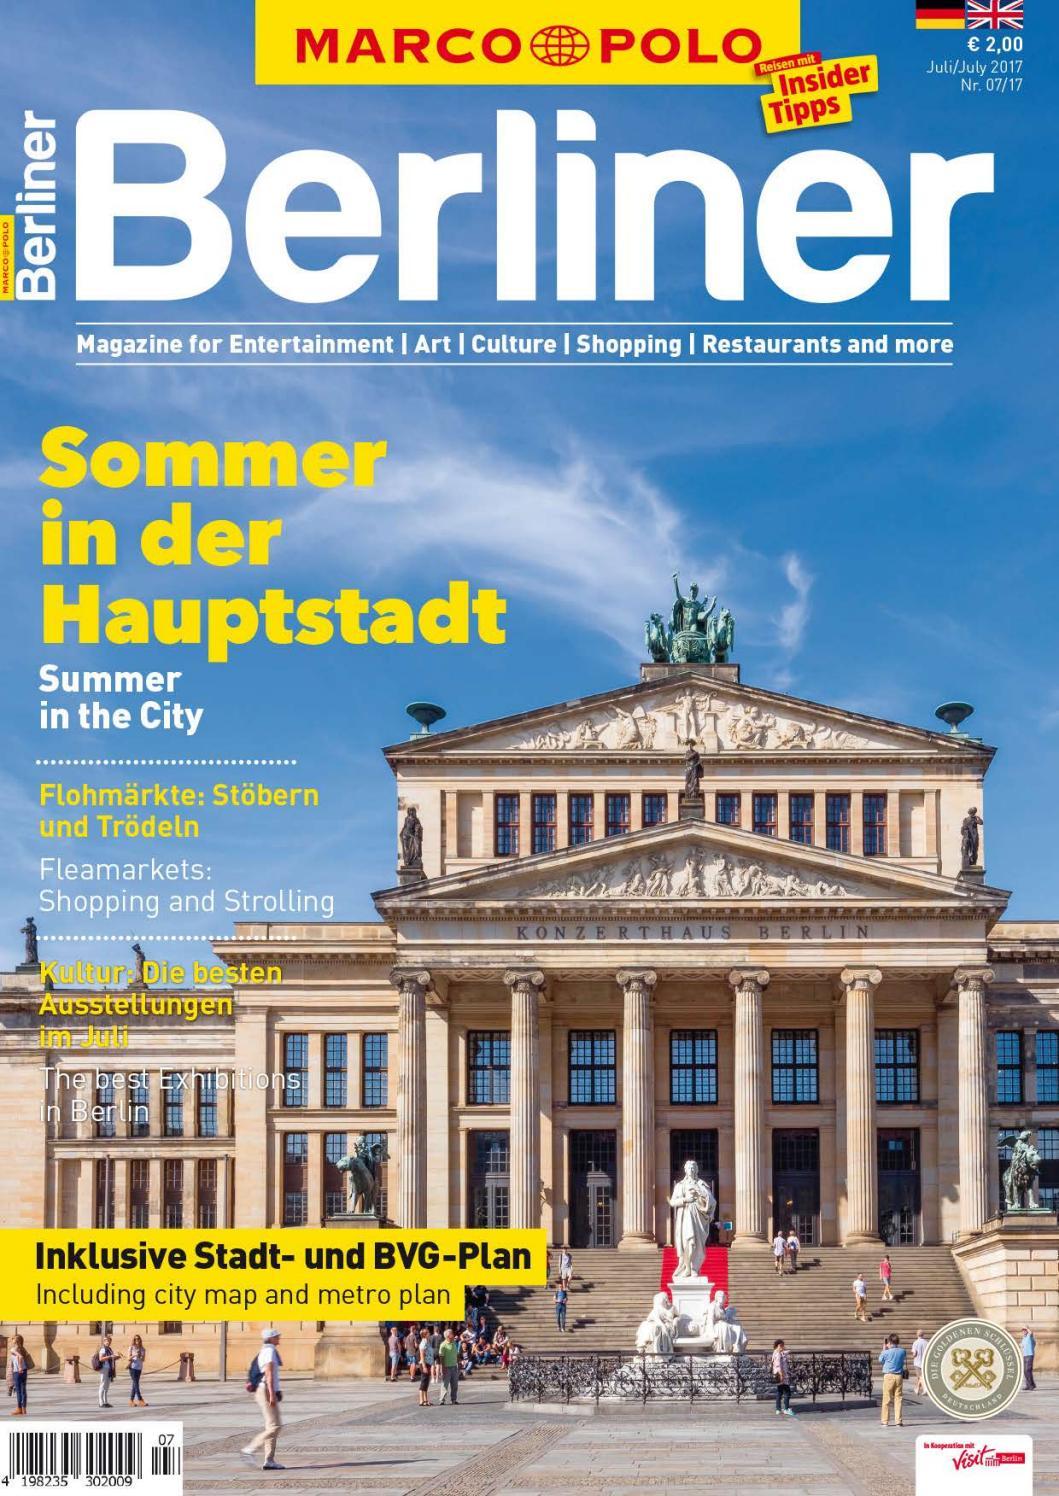 Marco Polo Berliner #07/17 by Berlin Medien GmbH - issuu